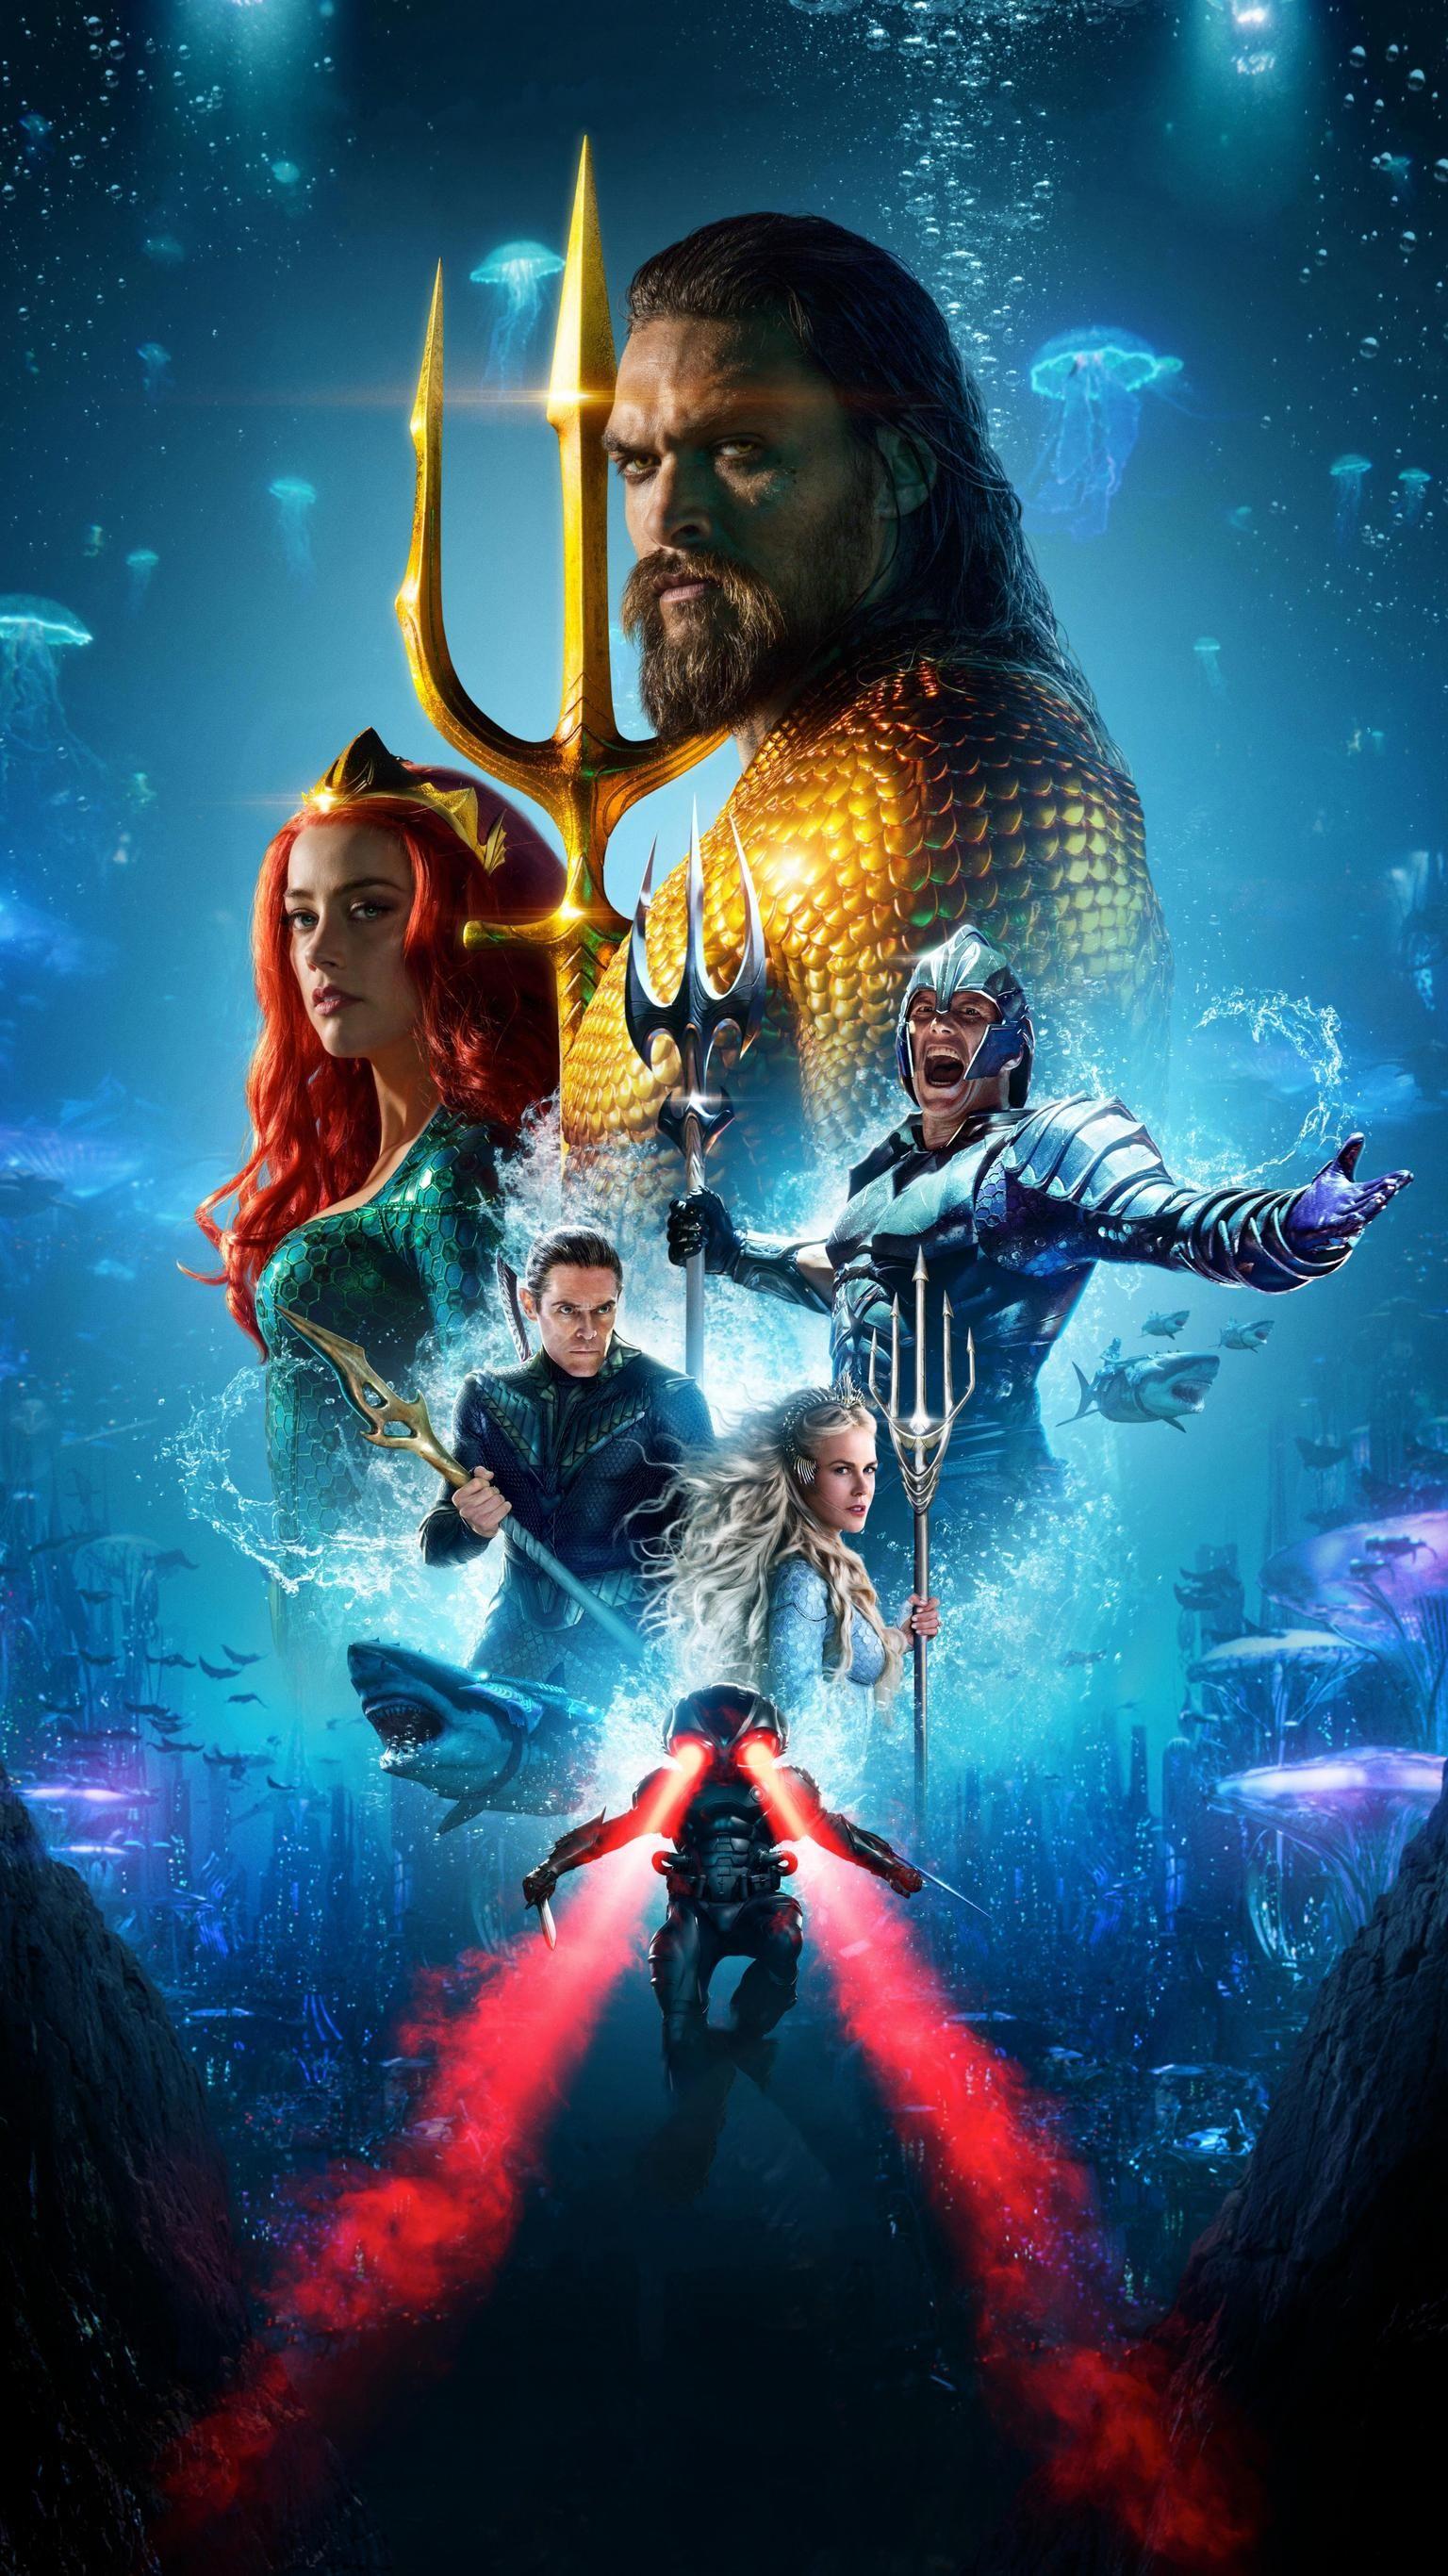 Moviemania Textless High Resolution Movie Wallpapers Aquaman Film Aquaman Aquaman 2018